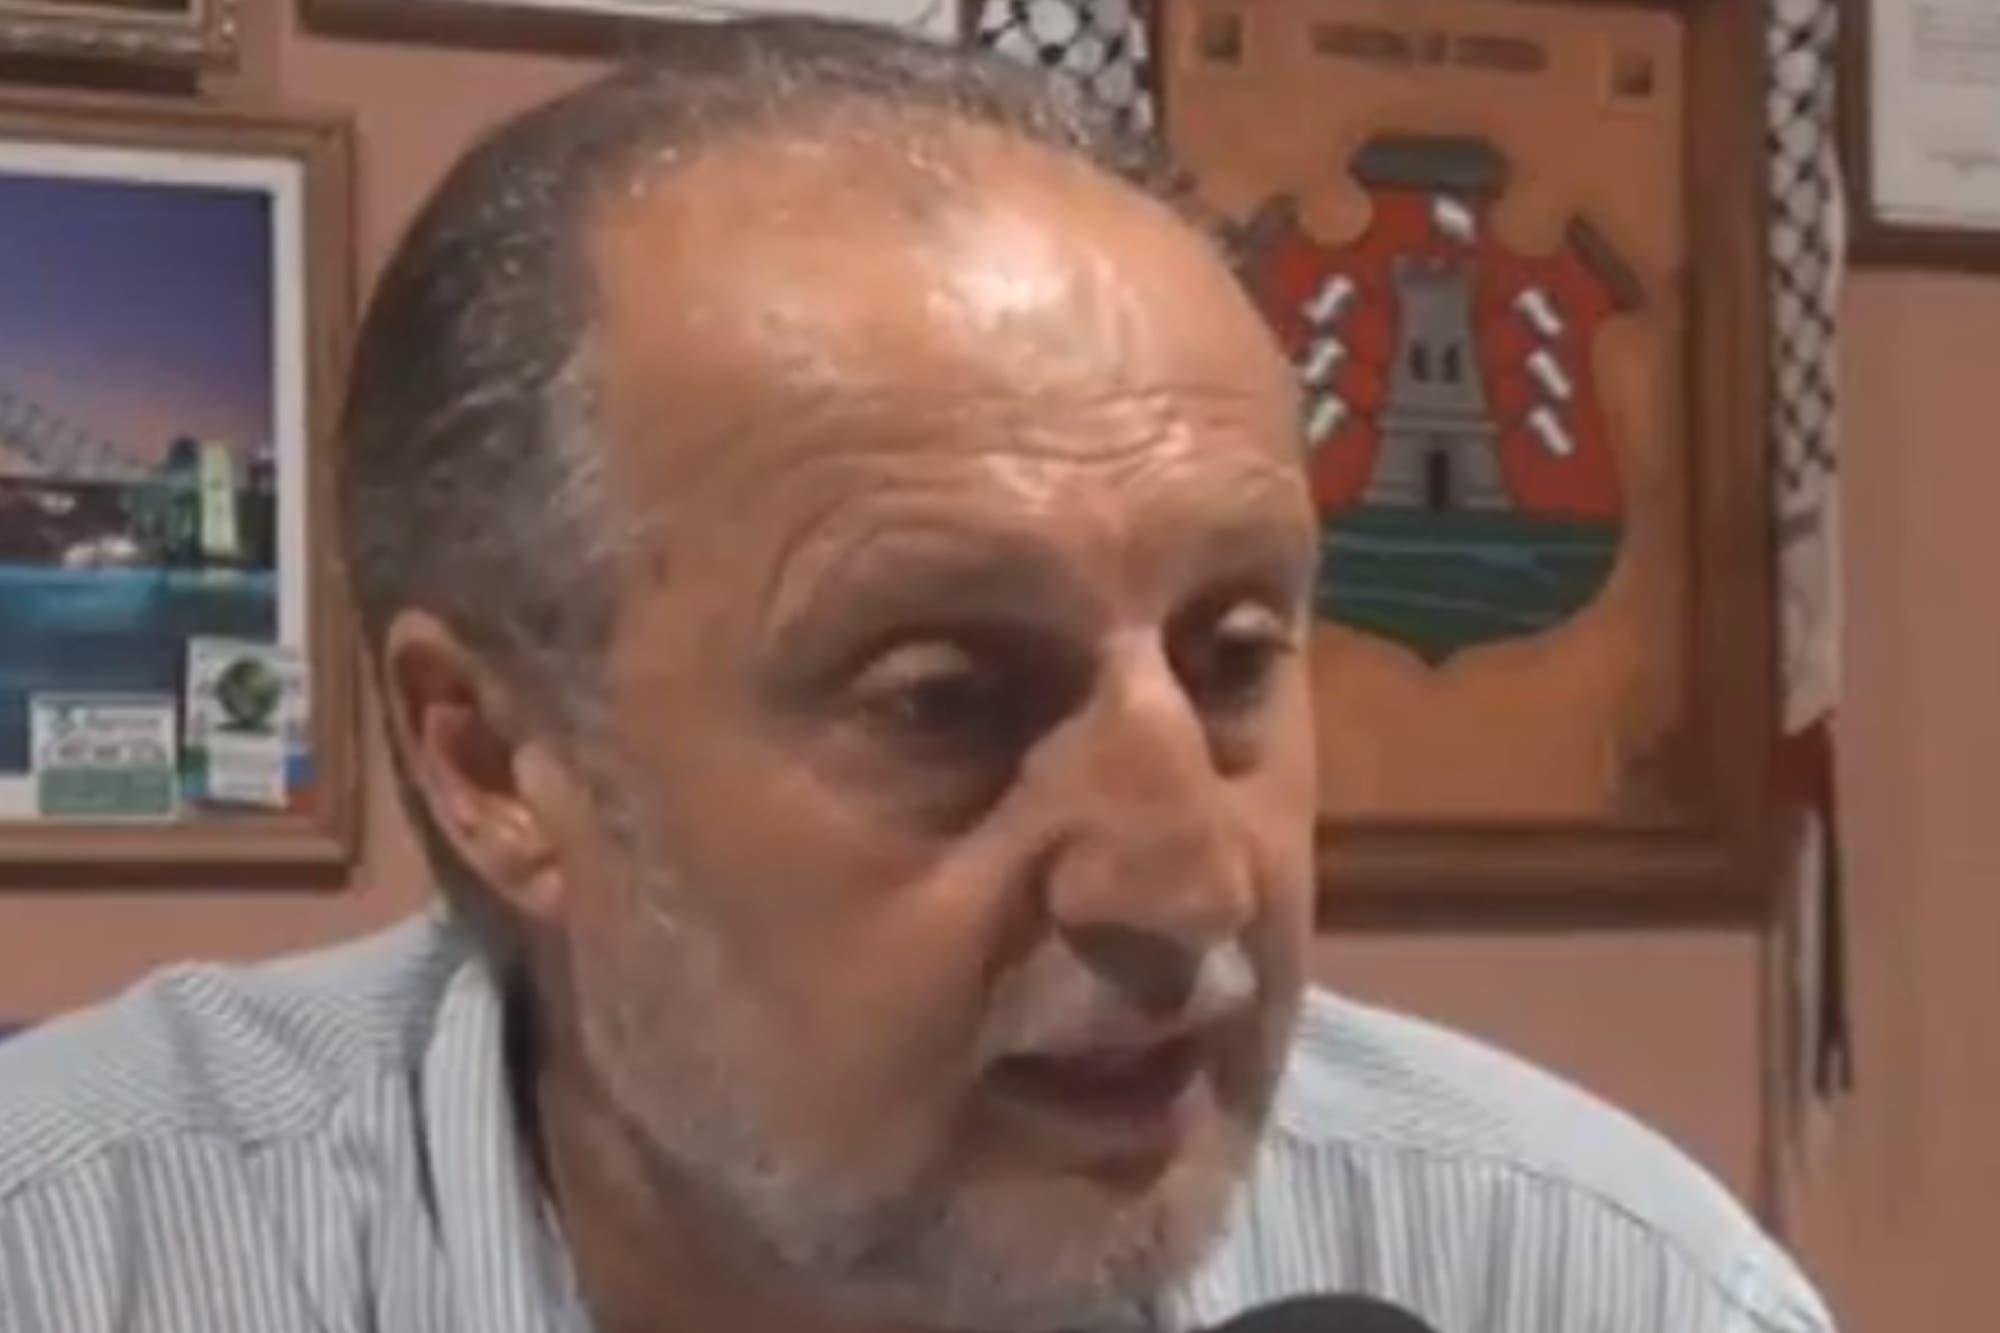 Apuñalaron a un intendente de Córdoba durante un evento: hay un detenido